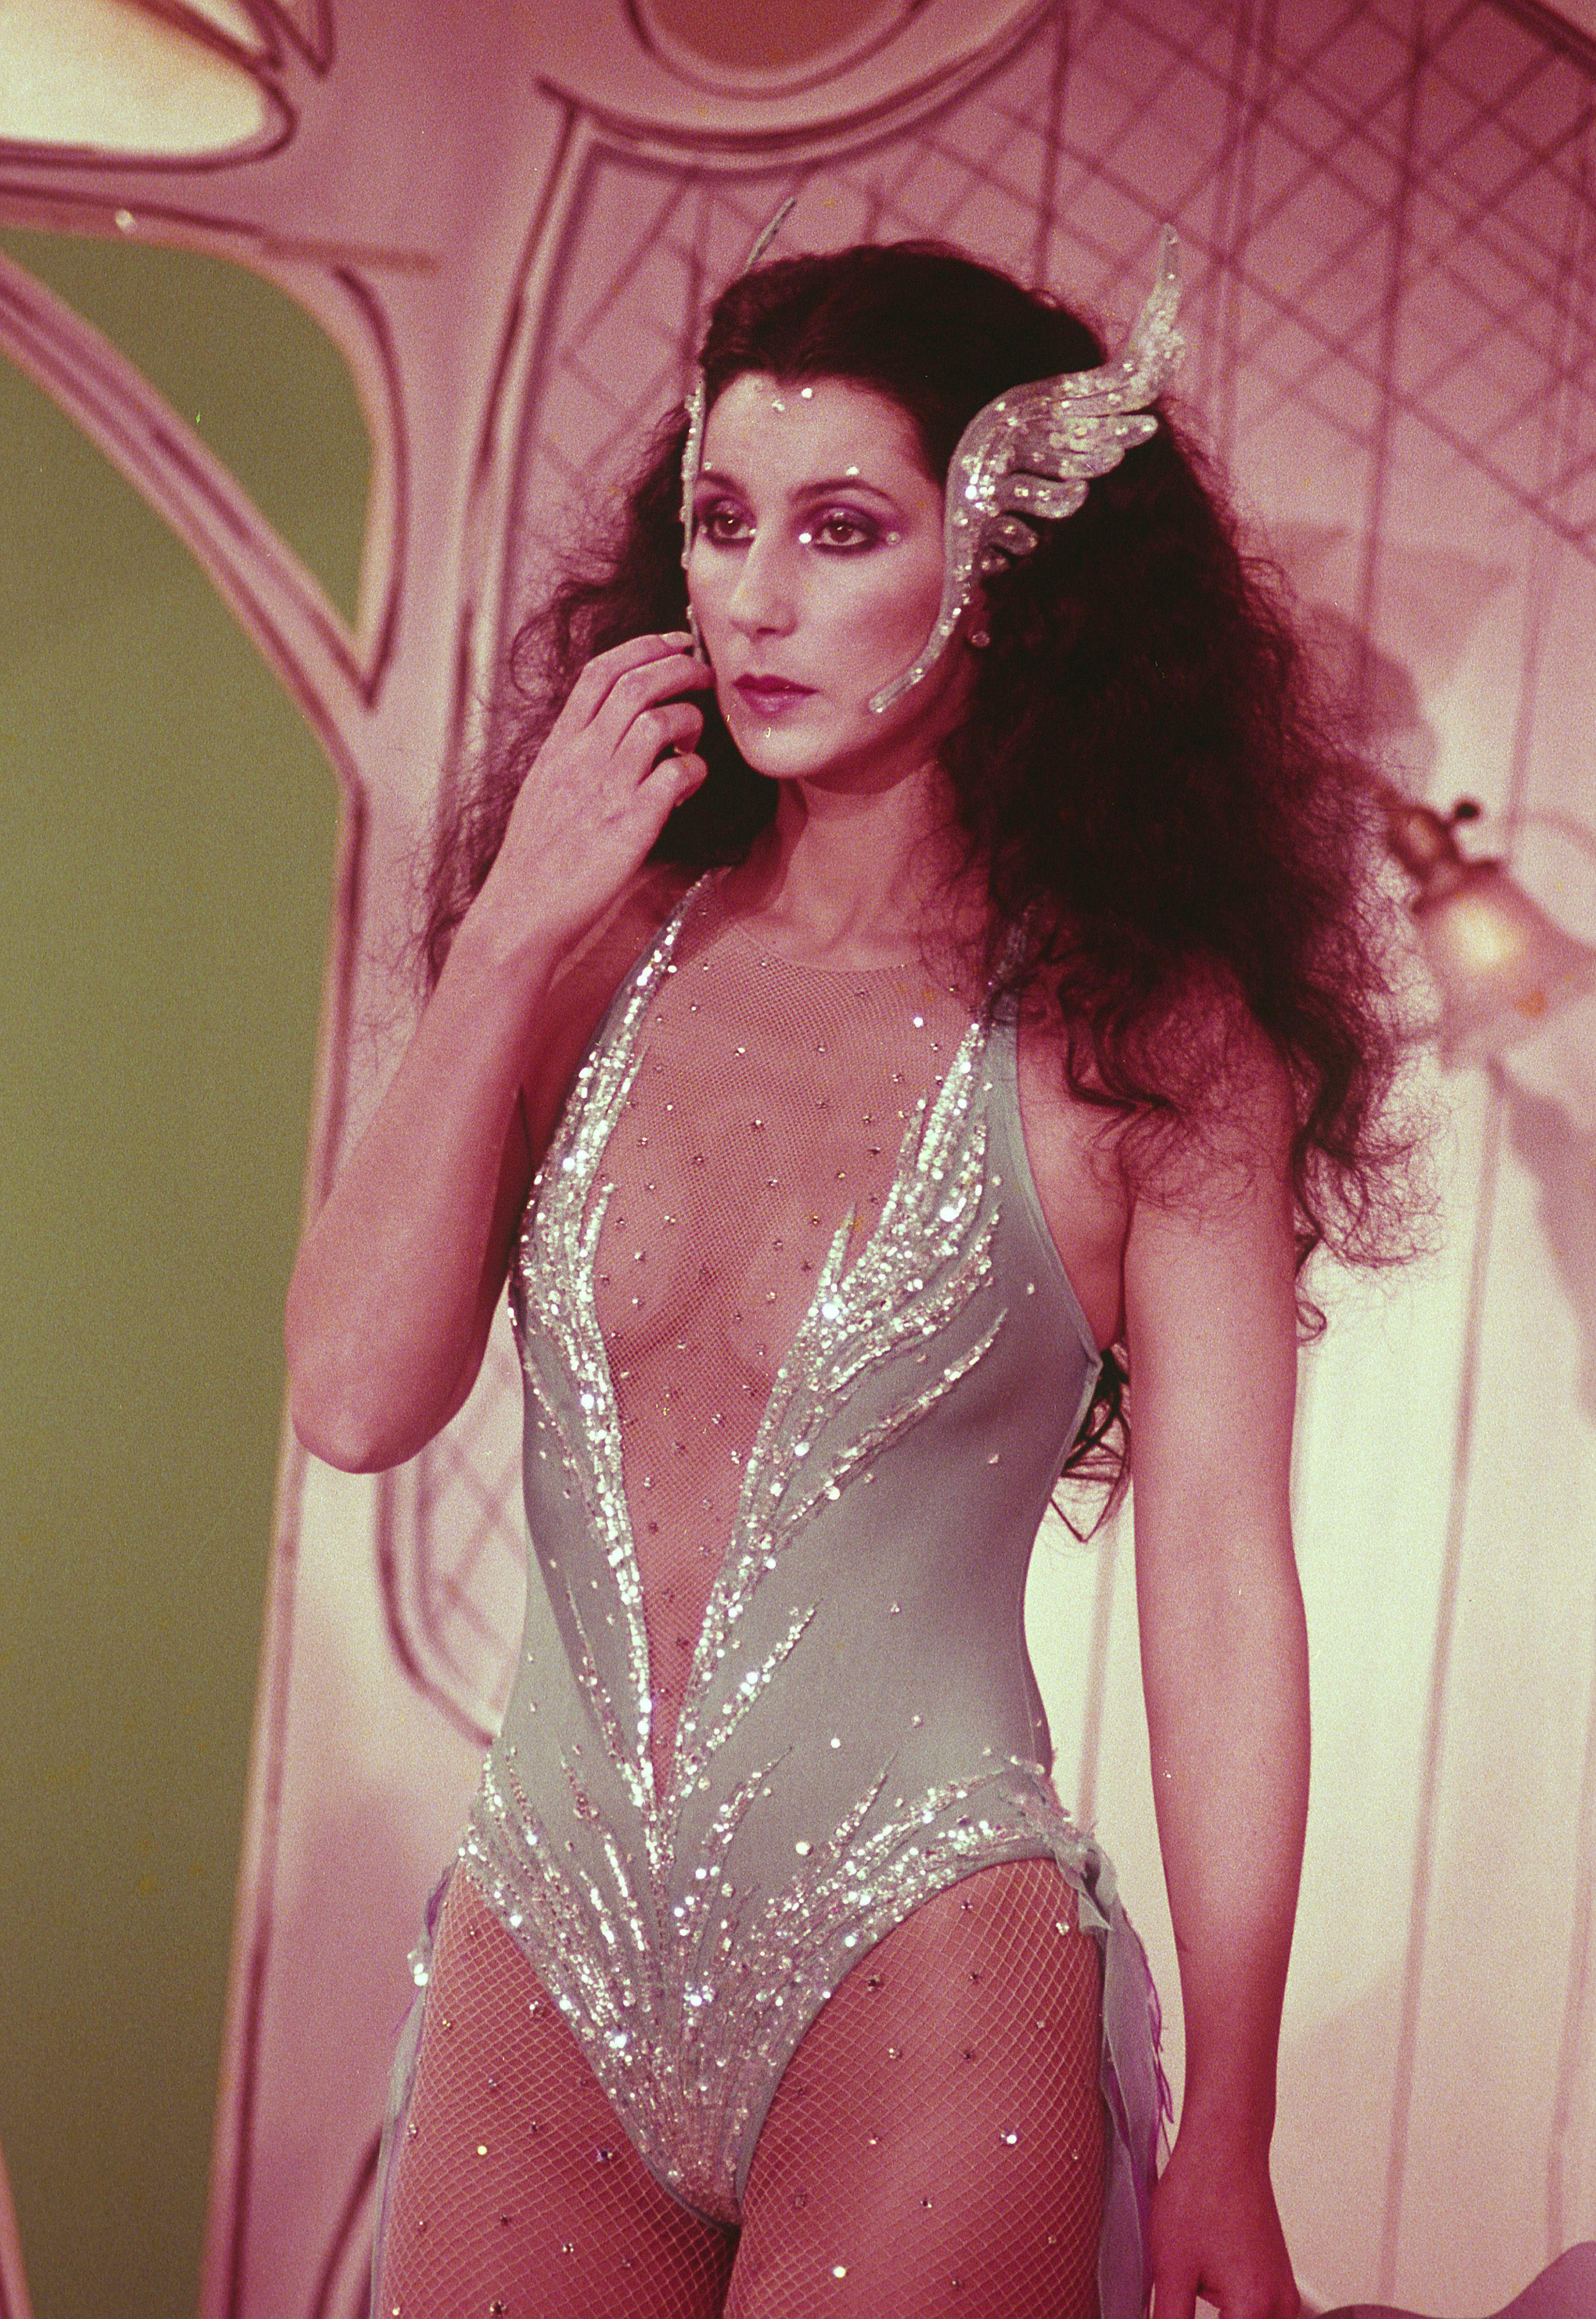 Cher Photographed by Nancy BarrCher-1980